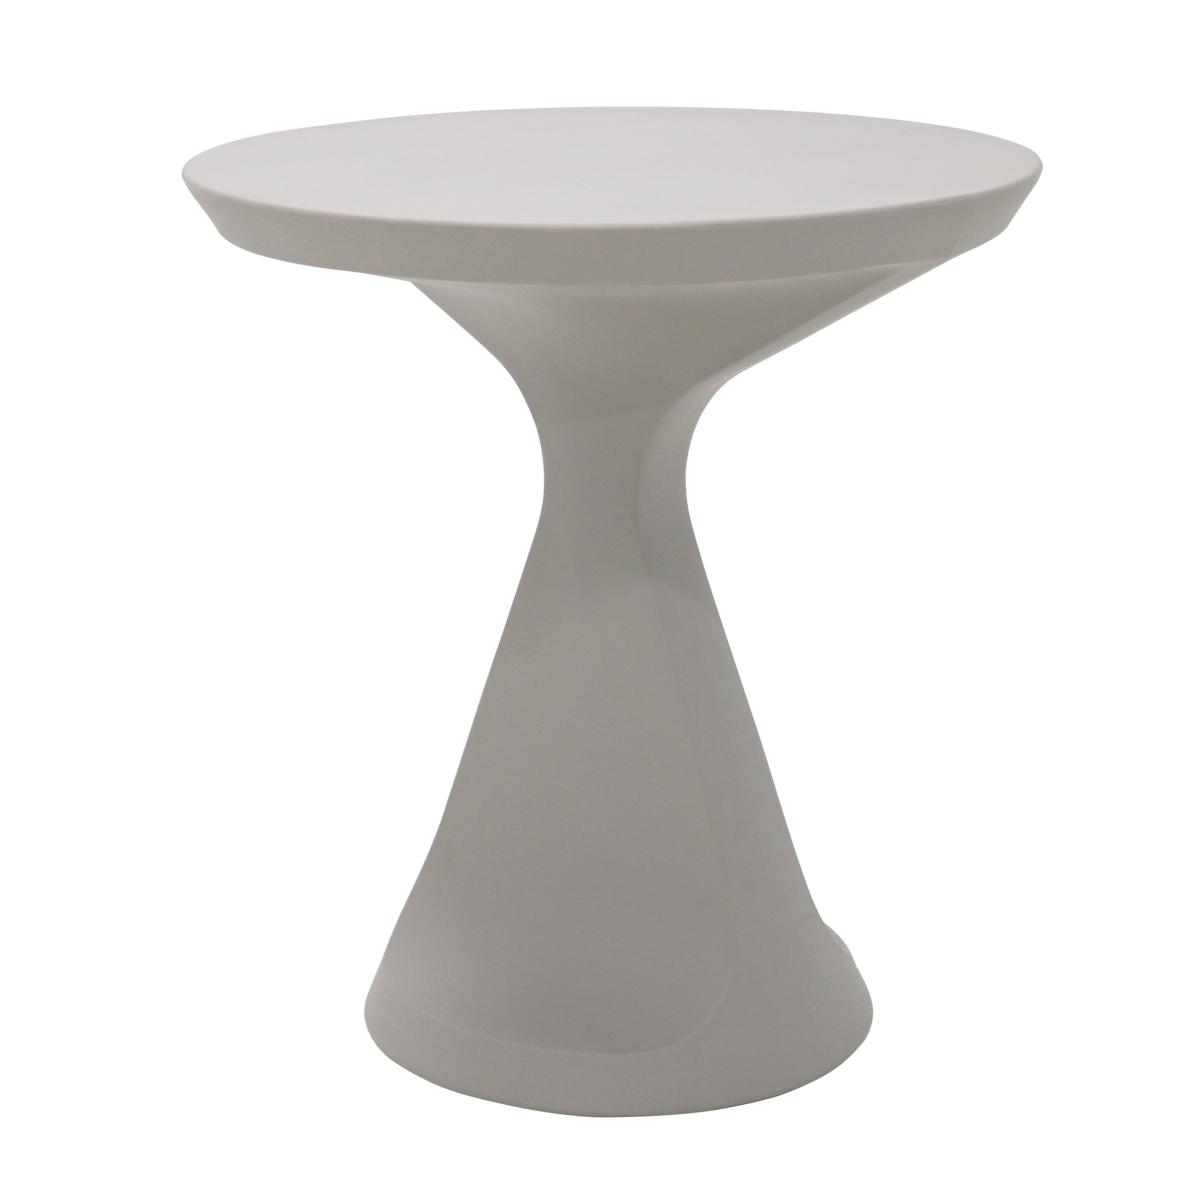 Round Table Tramontina Summa in Polyethylene Concrete